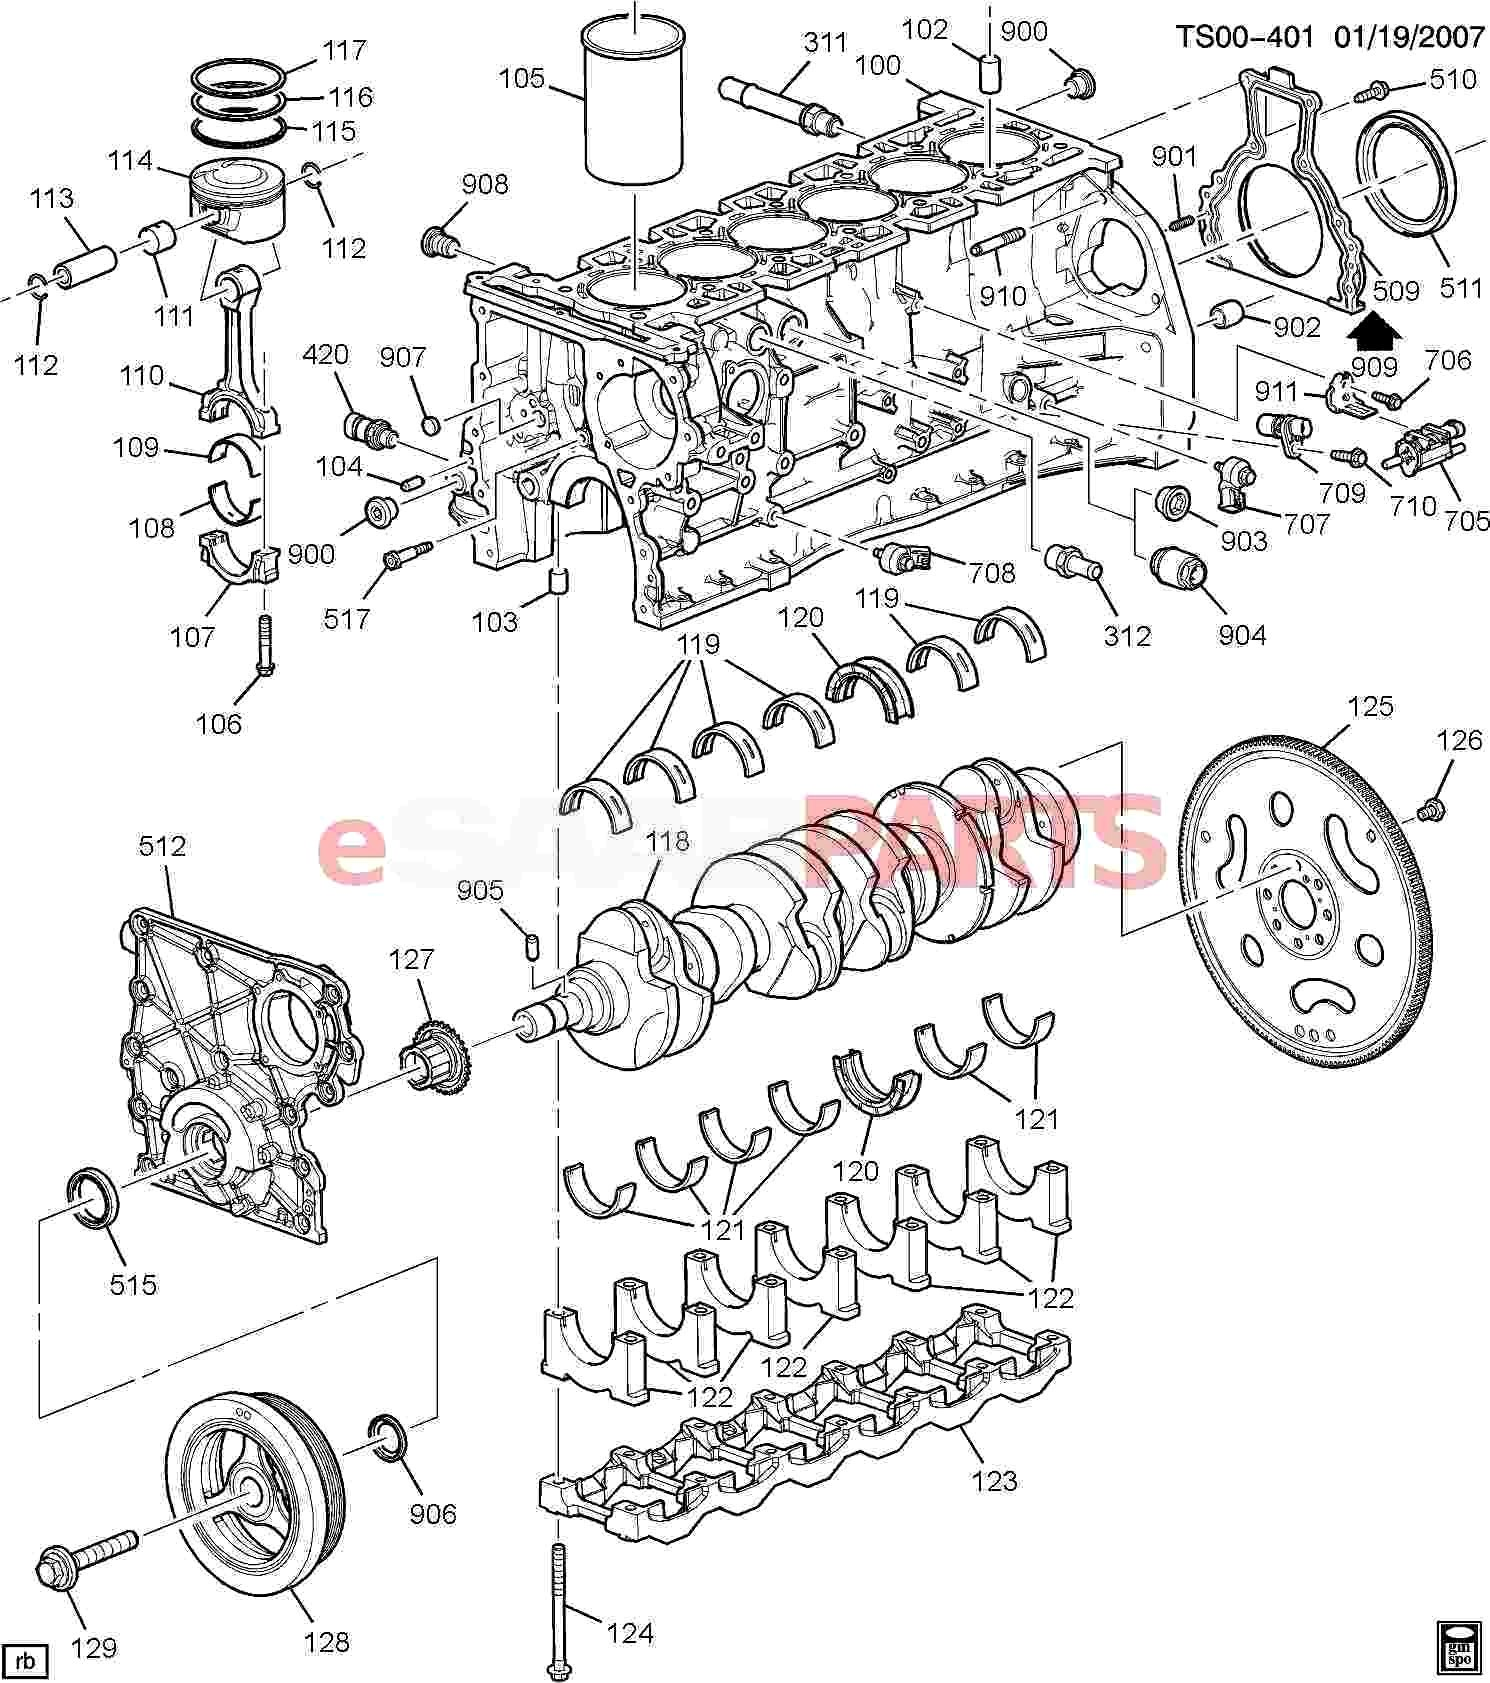 General Motors Parts Diagrams 2018 Chevrolet Performance Parts Catalog Beautiful Chevy Van Parts Of General Motors Parts Diagrams